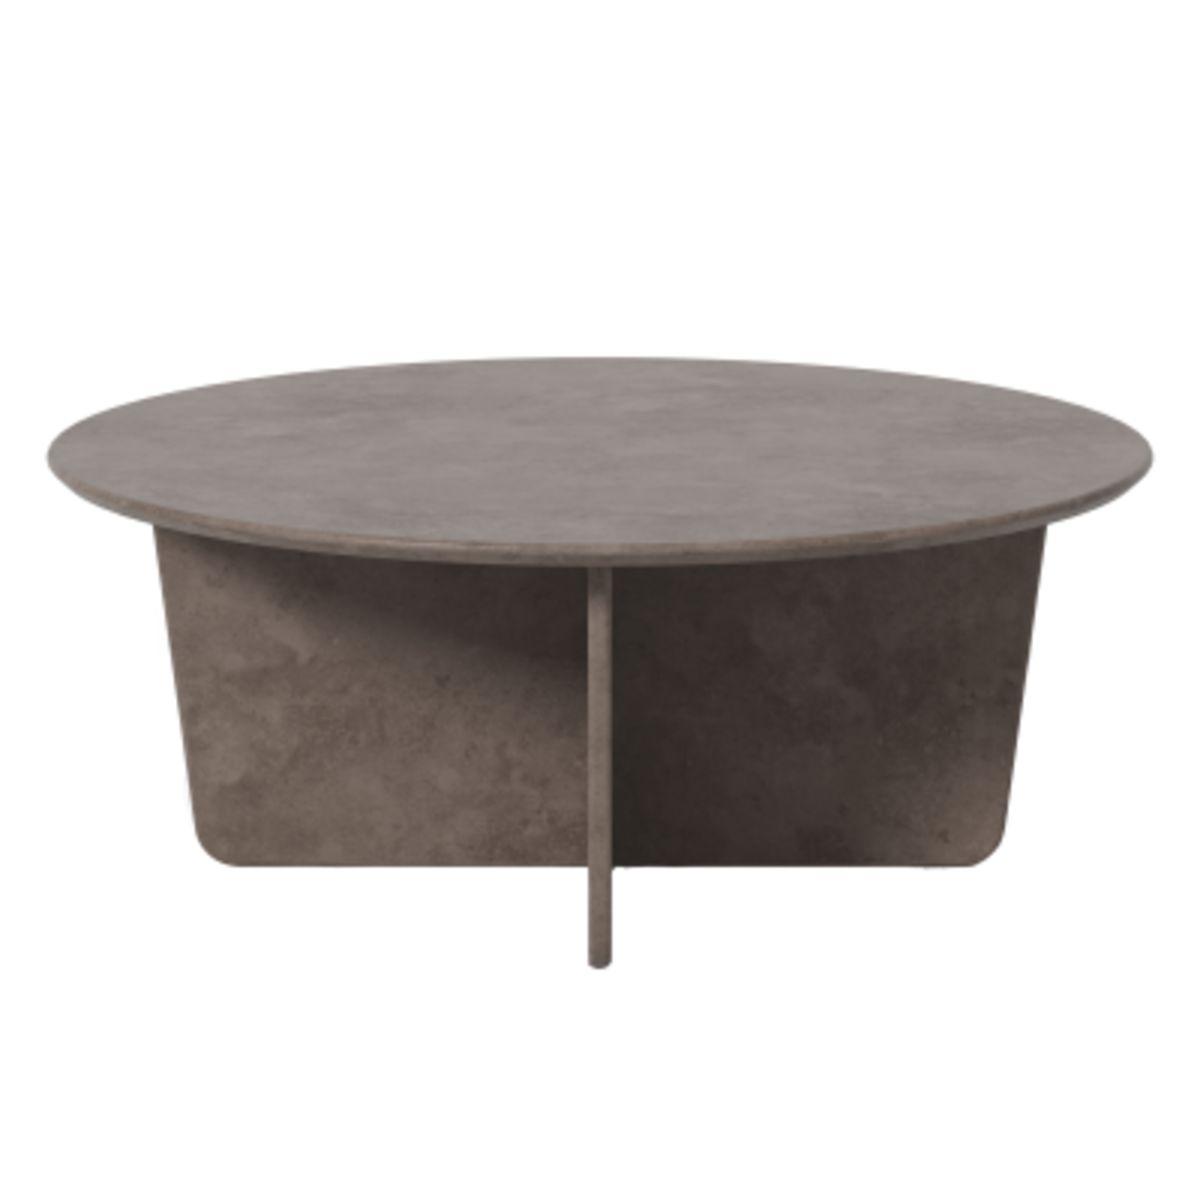 Tableau Coffee Table, Dark Atlantico Limestone, Round Top